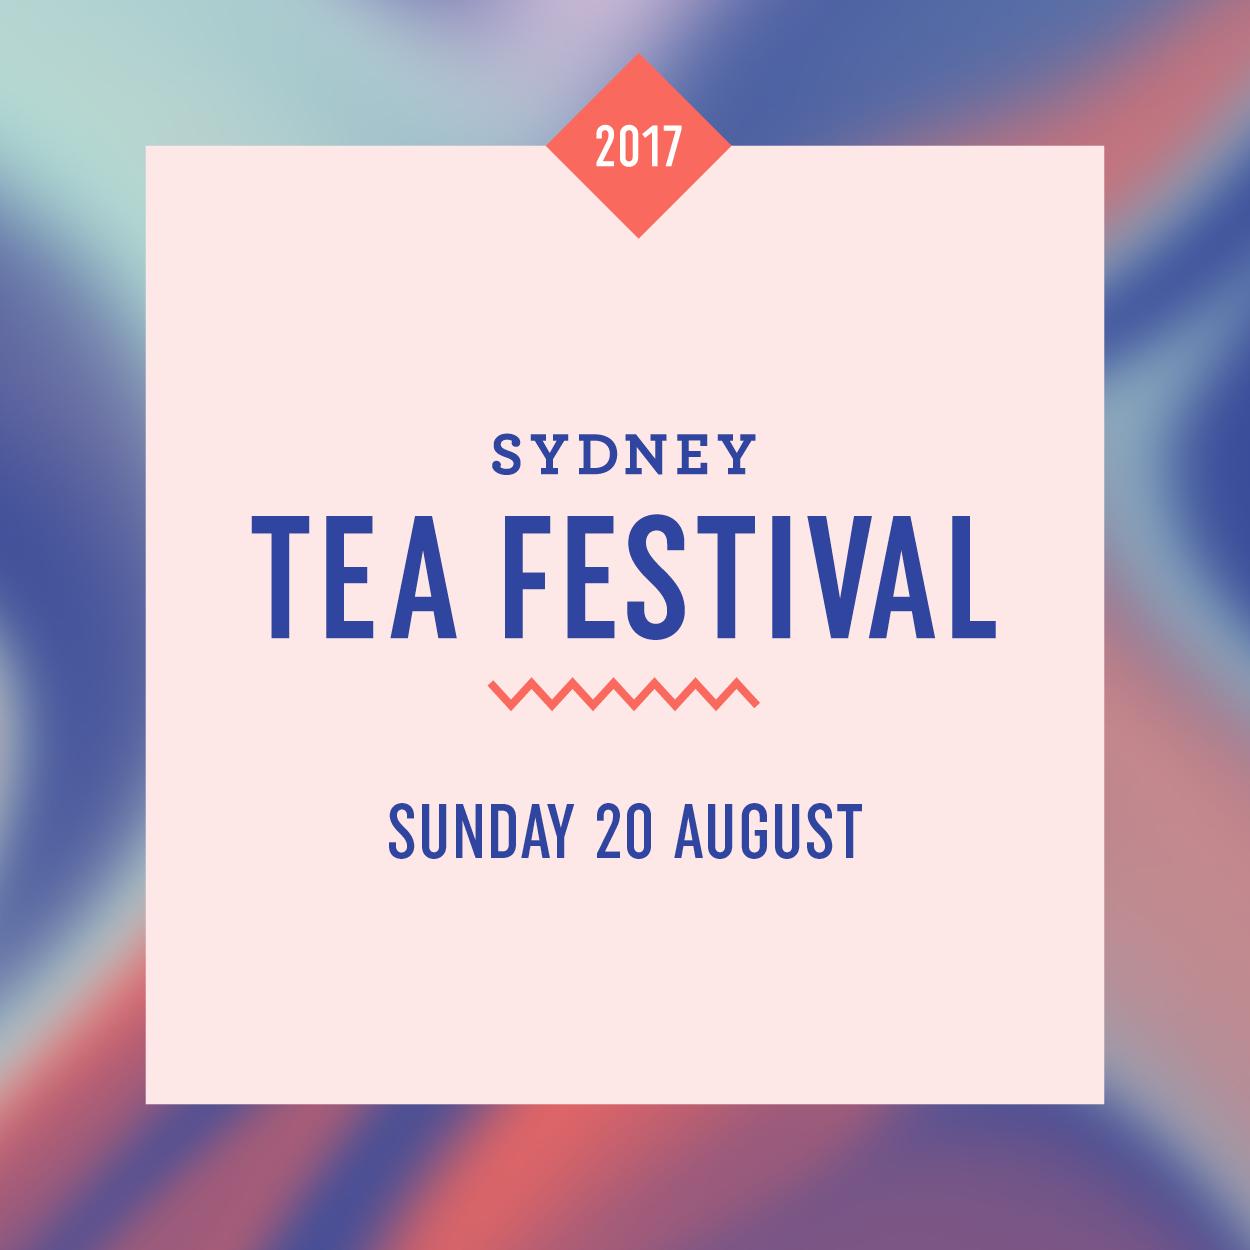 Sydney Tea Festival 2017